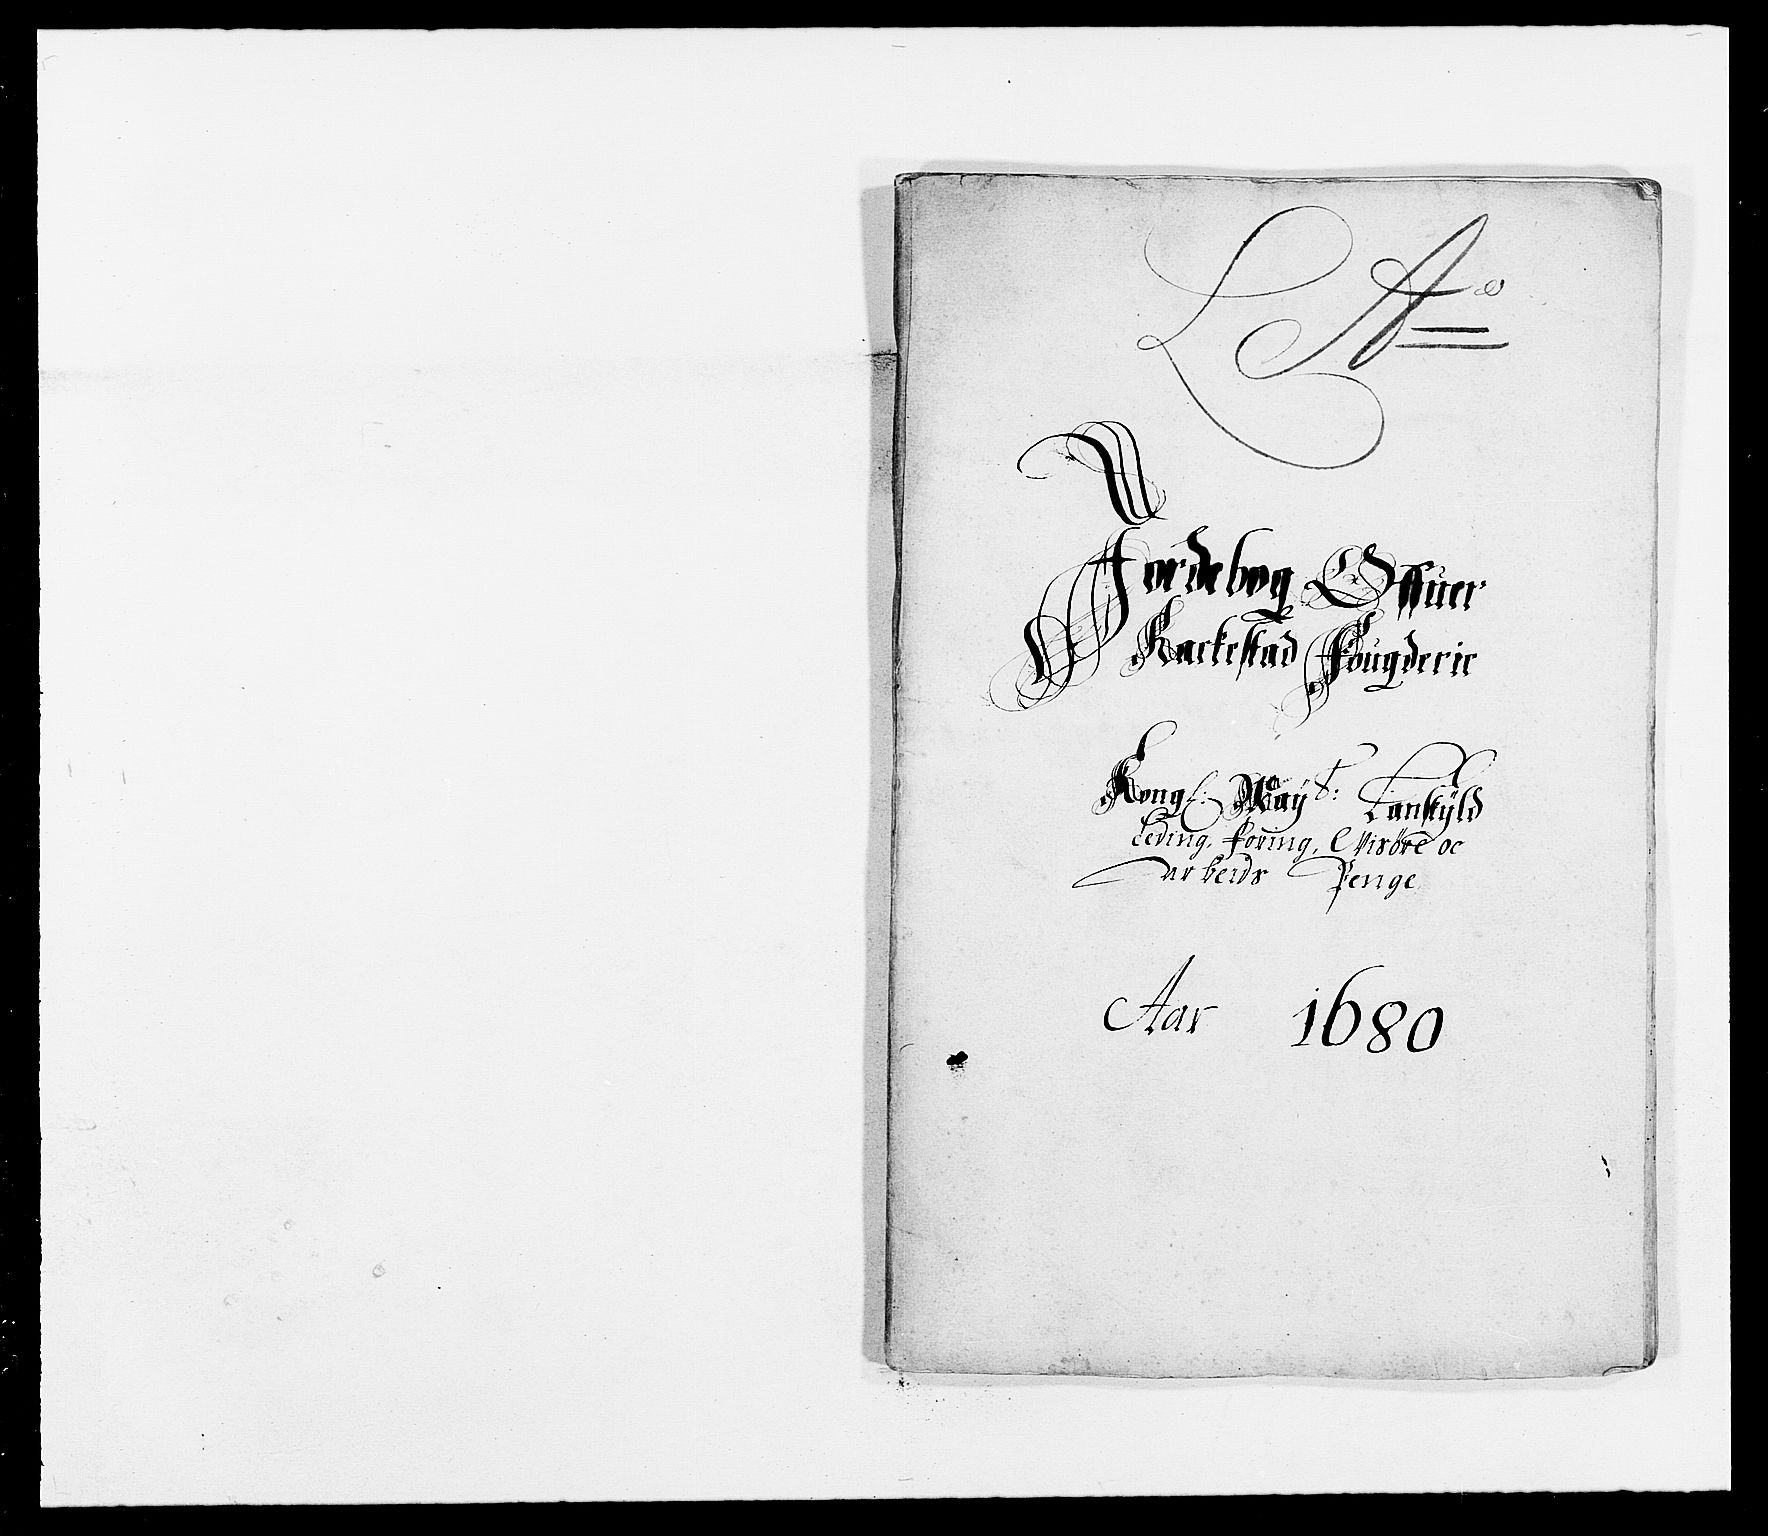 RA, Rentekammeret inntil 1814, Reviderte regnskaper, Fogderegnskap, R05/L0272: Fogderegnskap Rakkestad, 1680-1681, s. 35